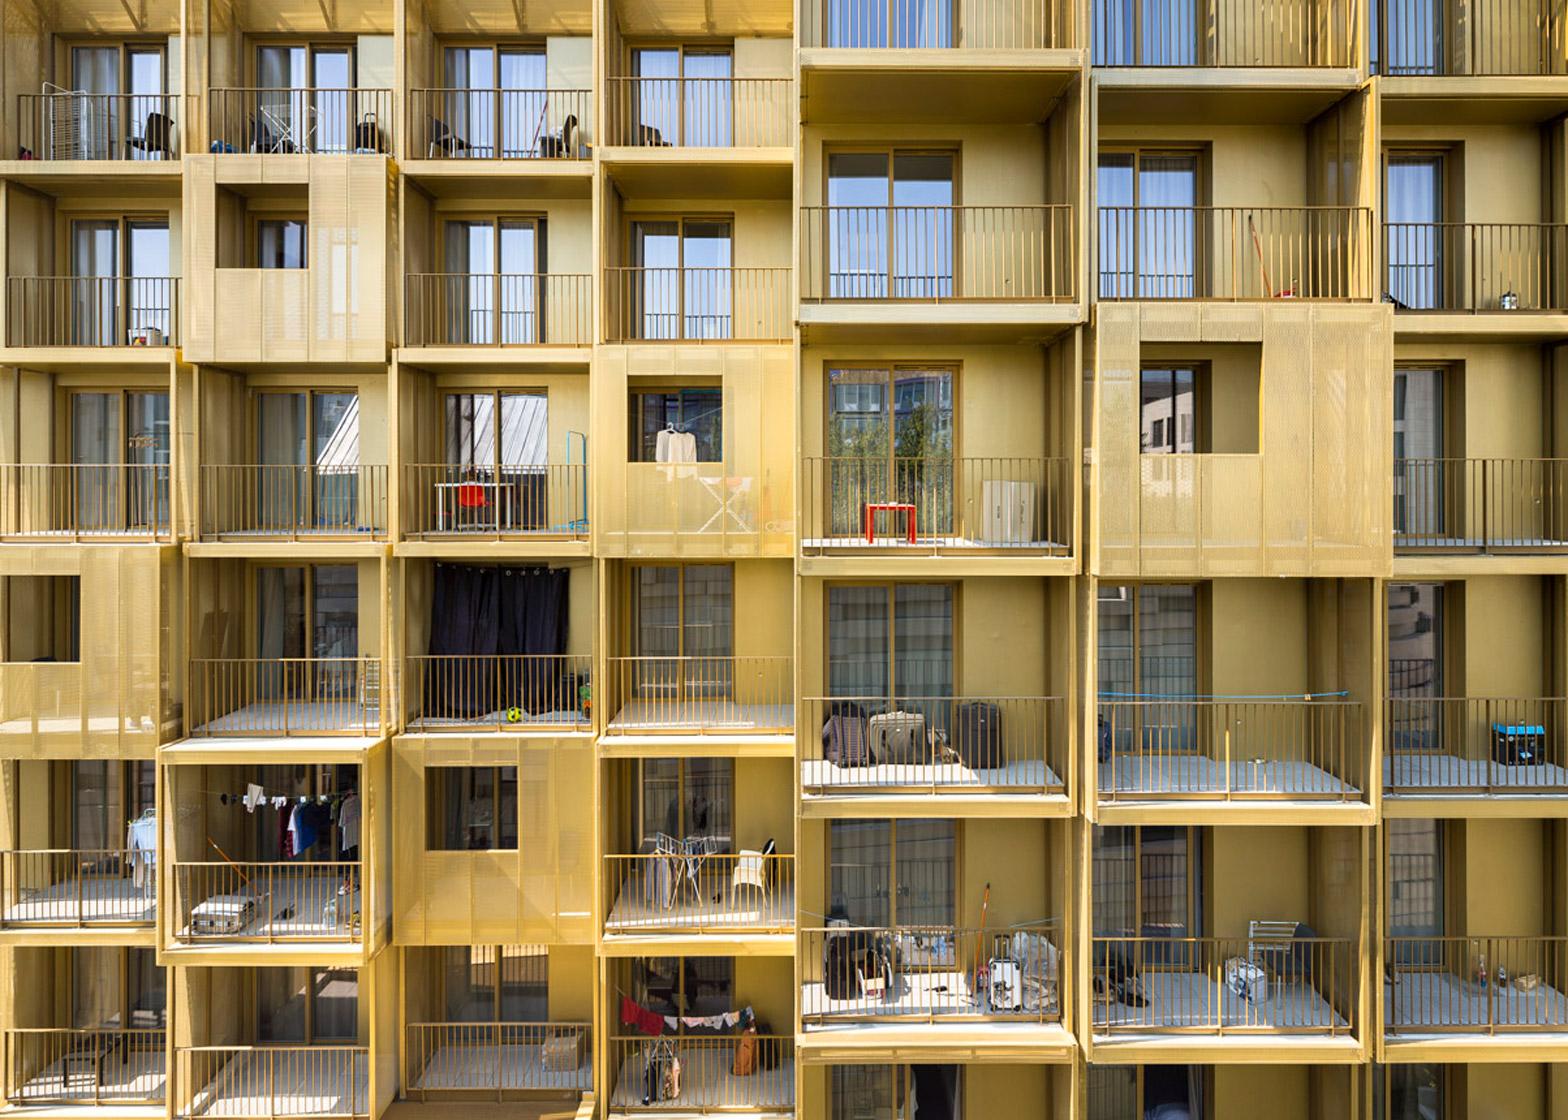 Golden Cube by Hamonic+Masson & Associés